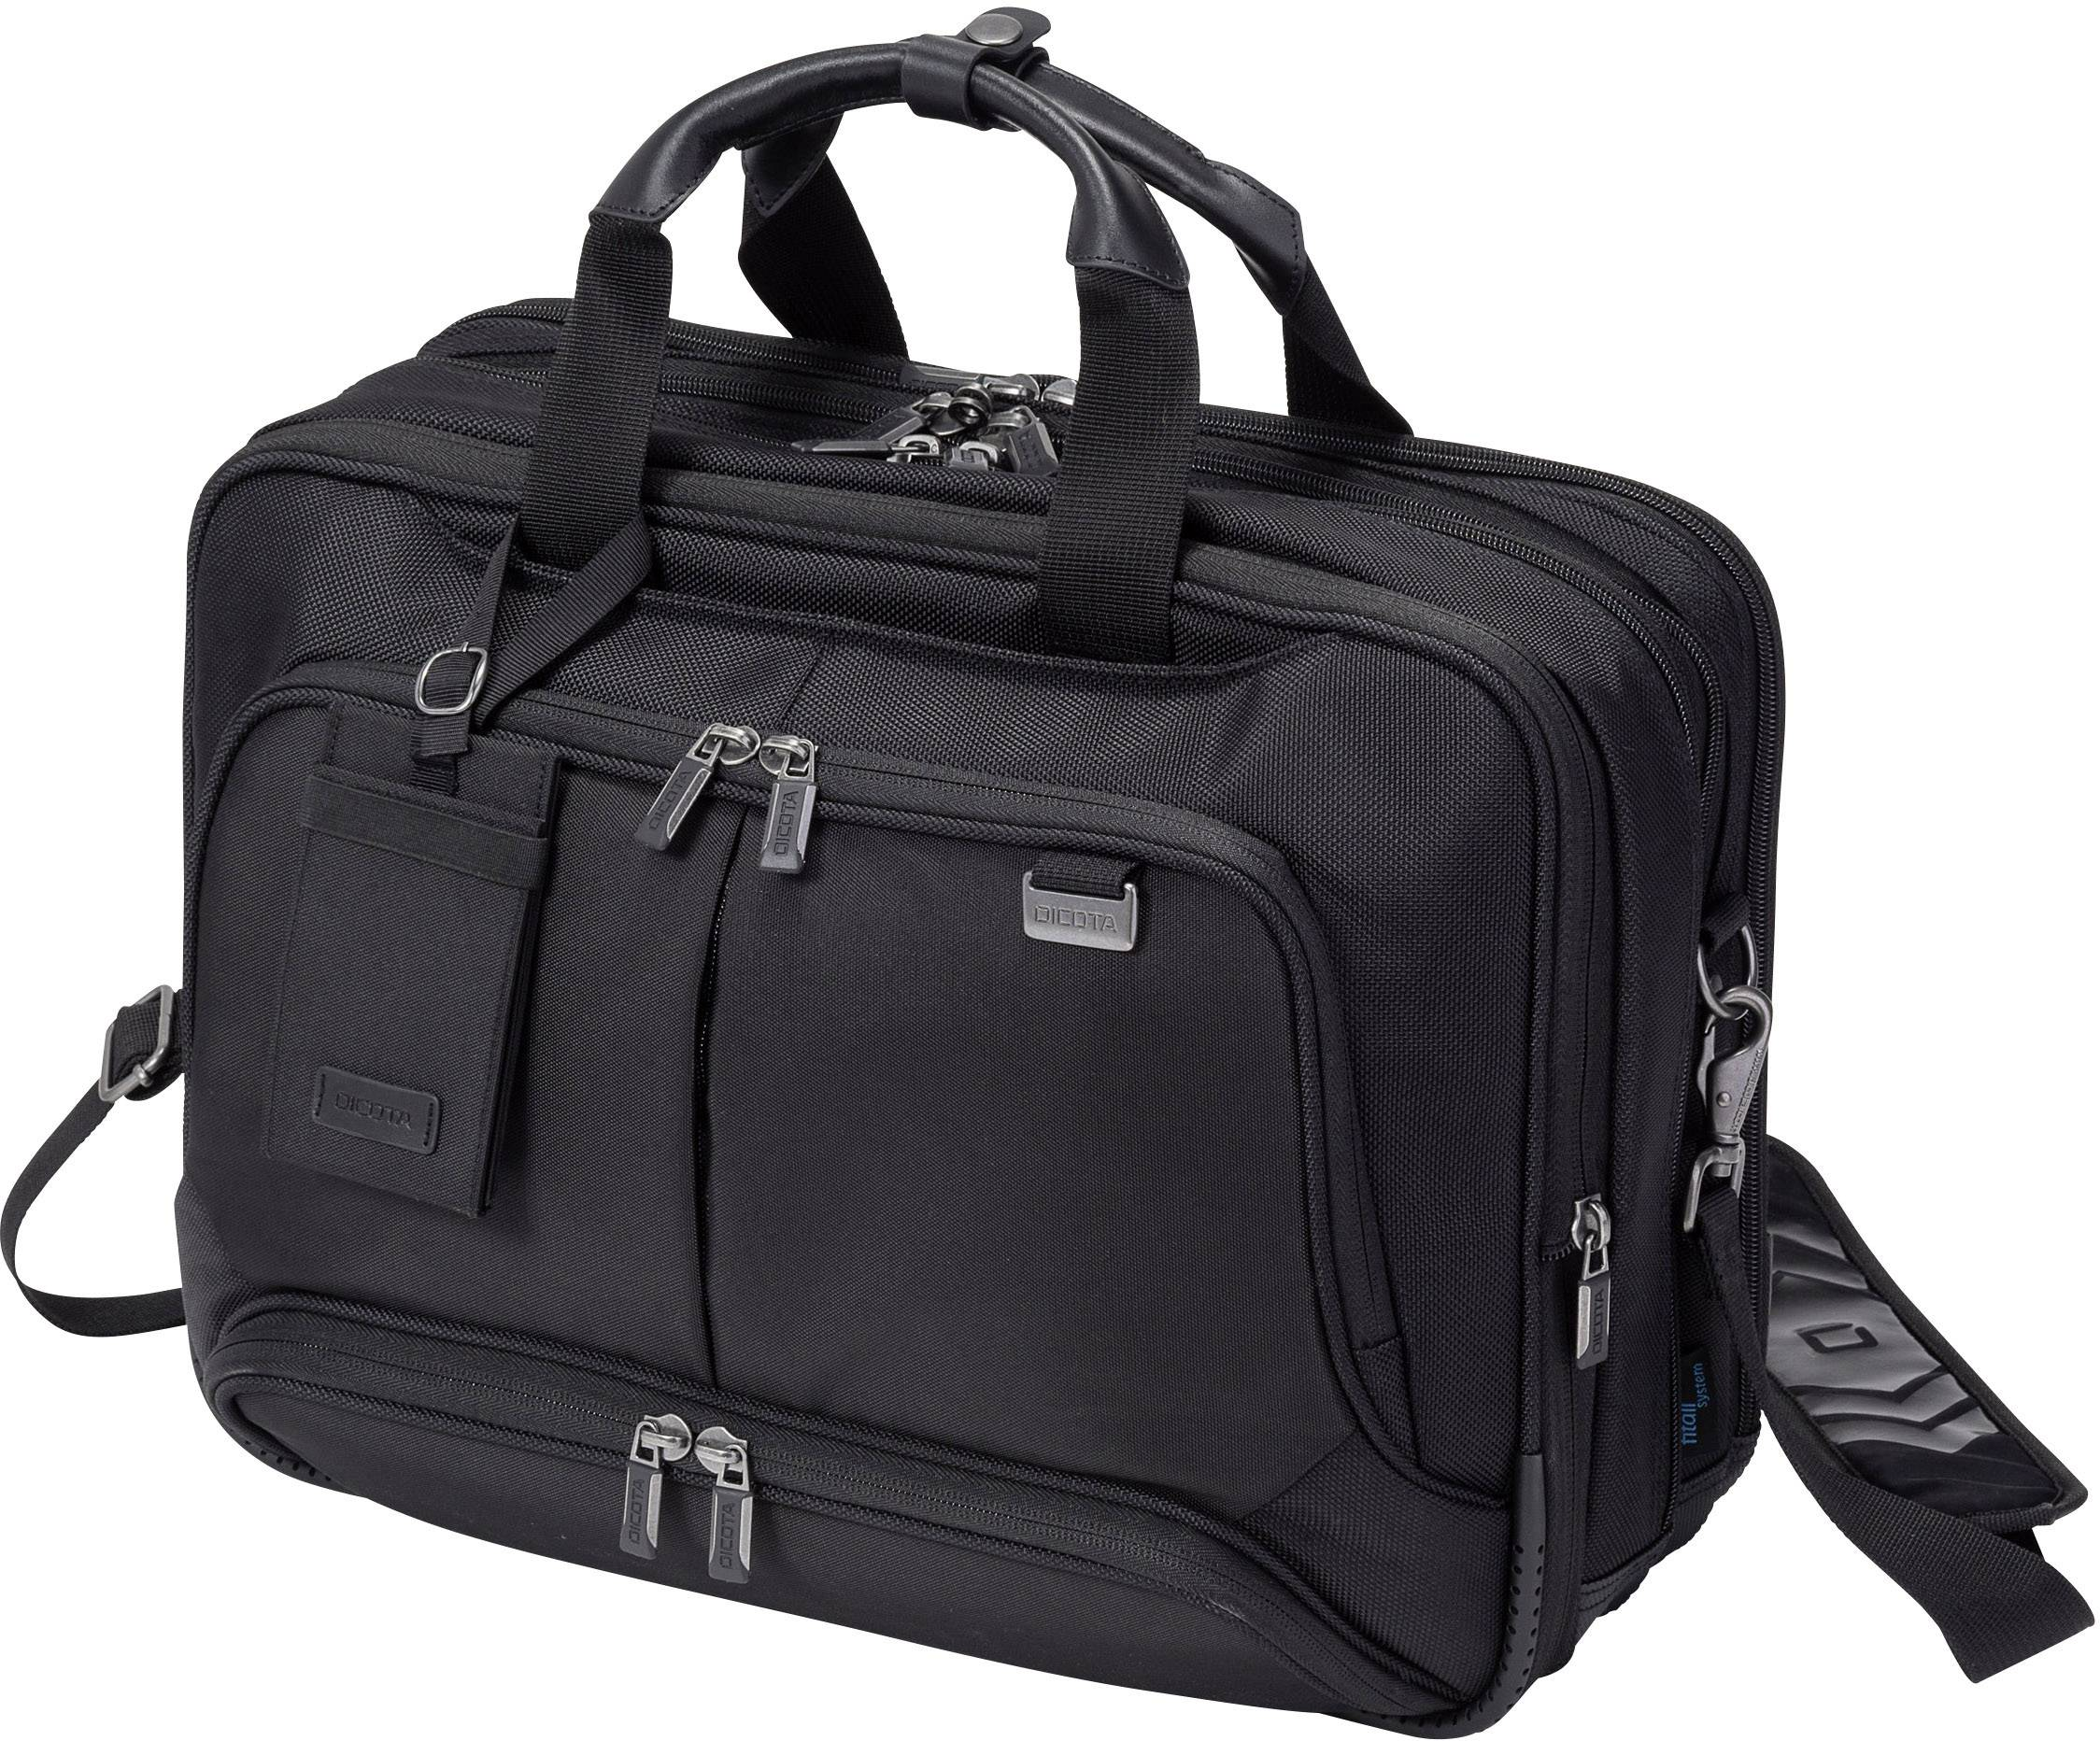 b3d038f997792 Dicota Notebook Tasche Top Travaller Twin Pro Passend für maximal ...